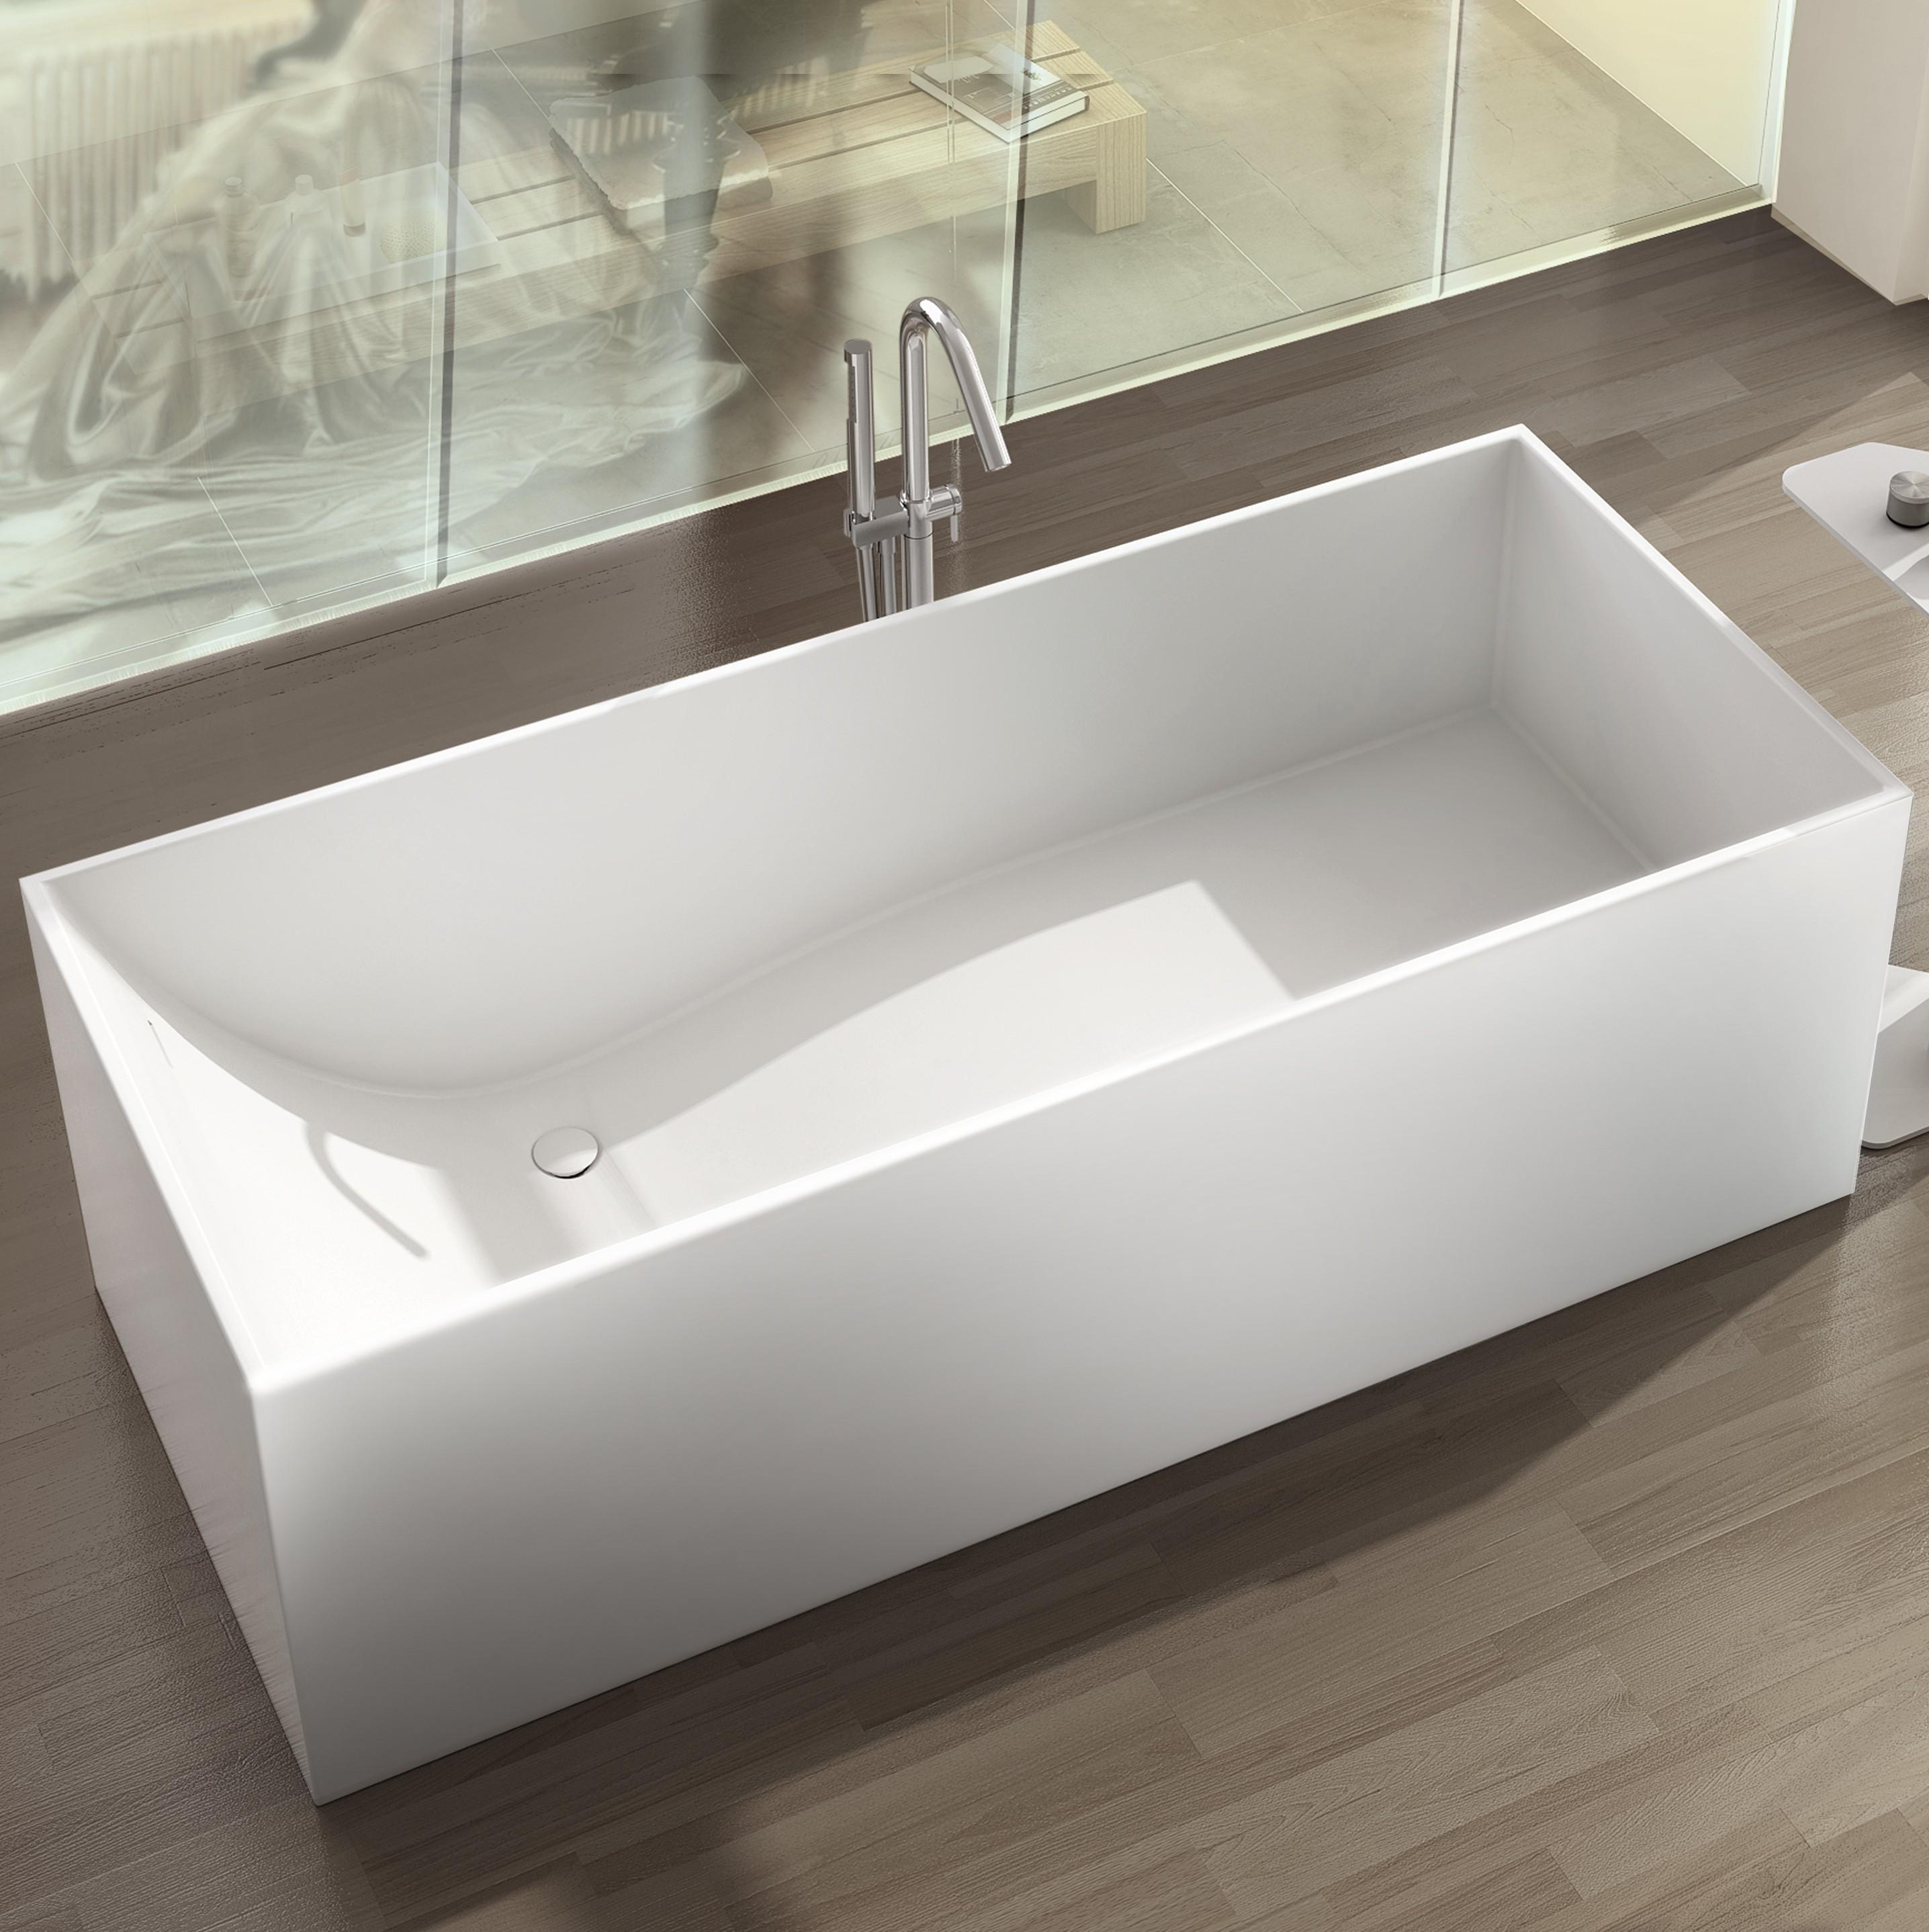 bathtub rock com bathtubs ideas river news bathroom stone manufacturer